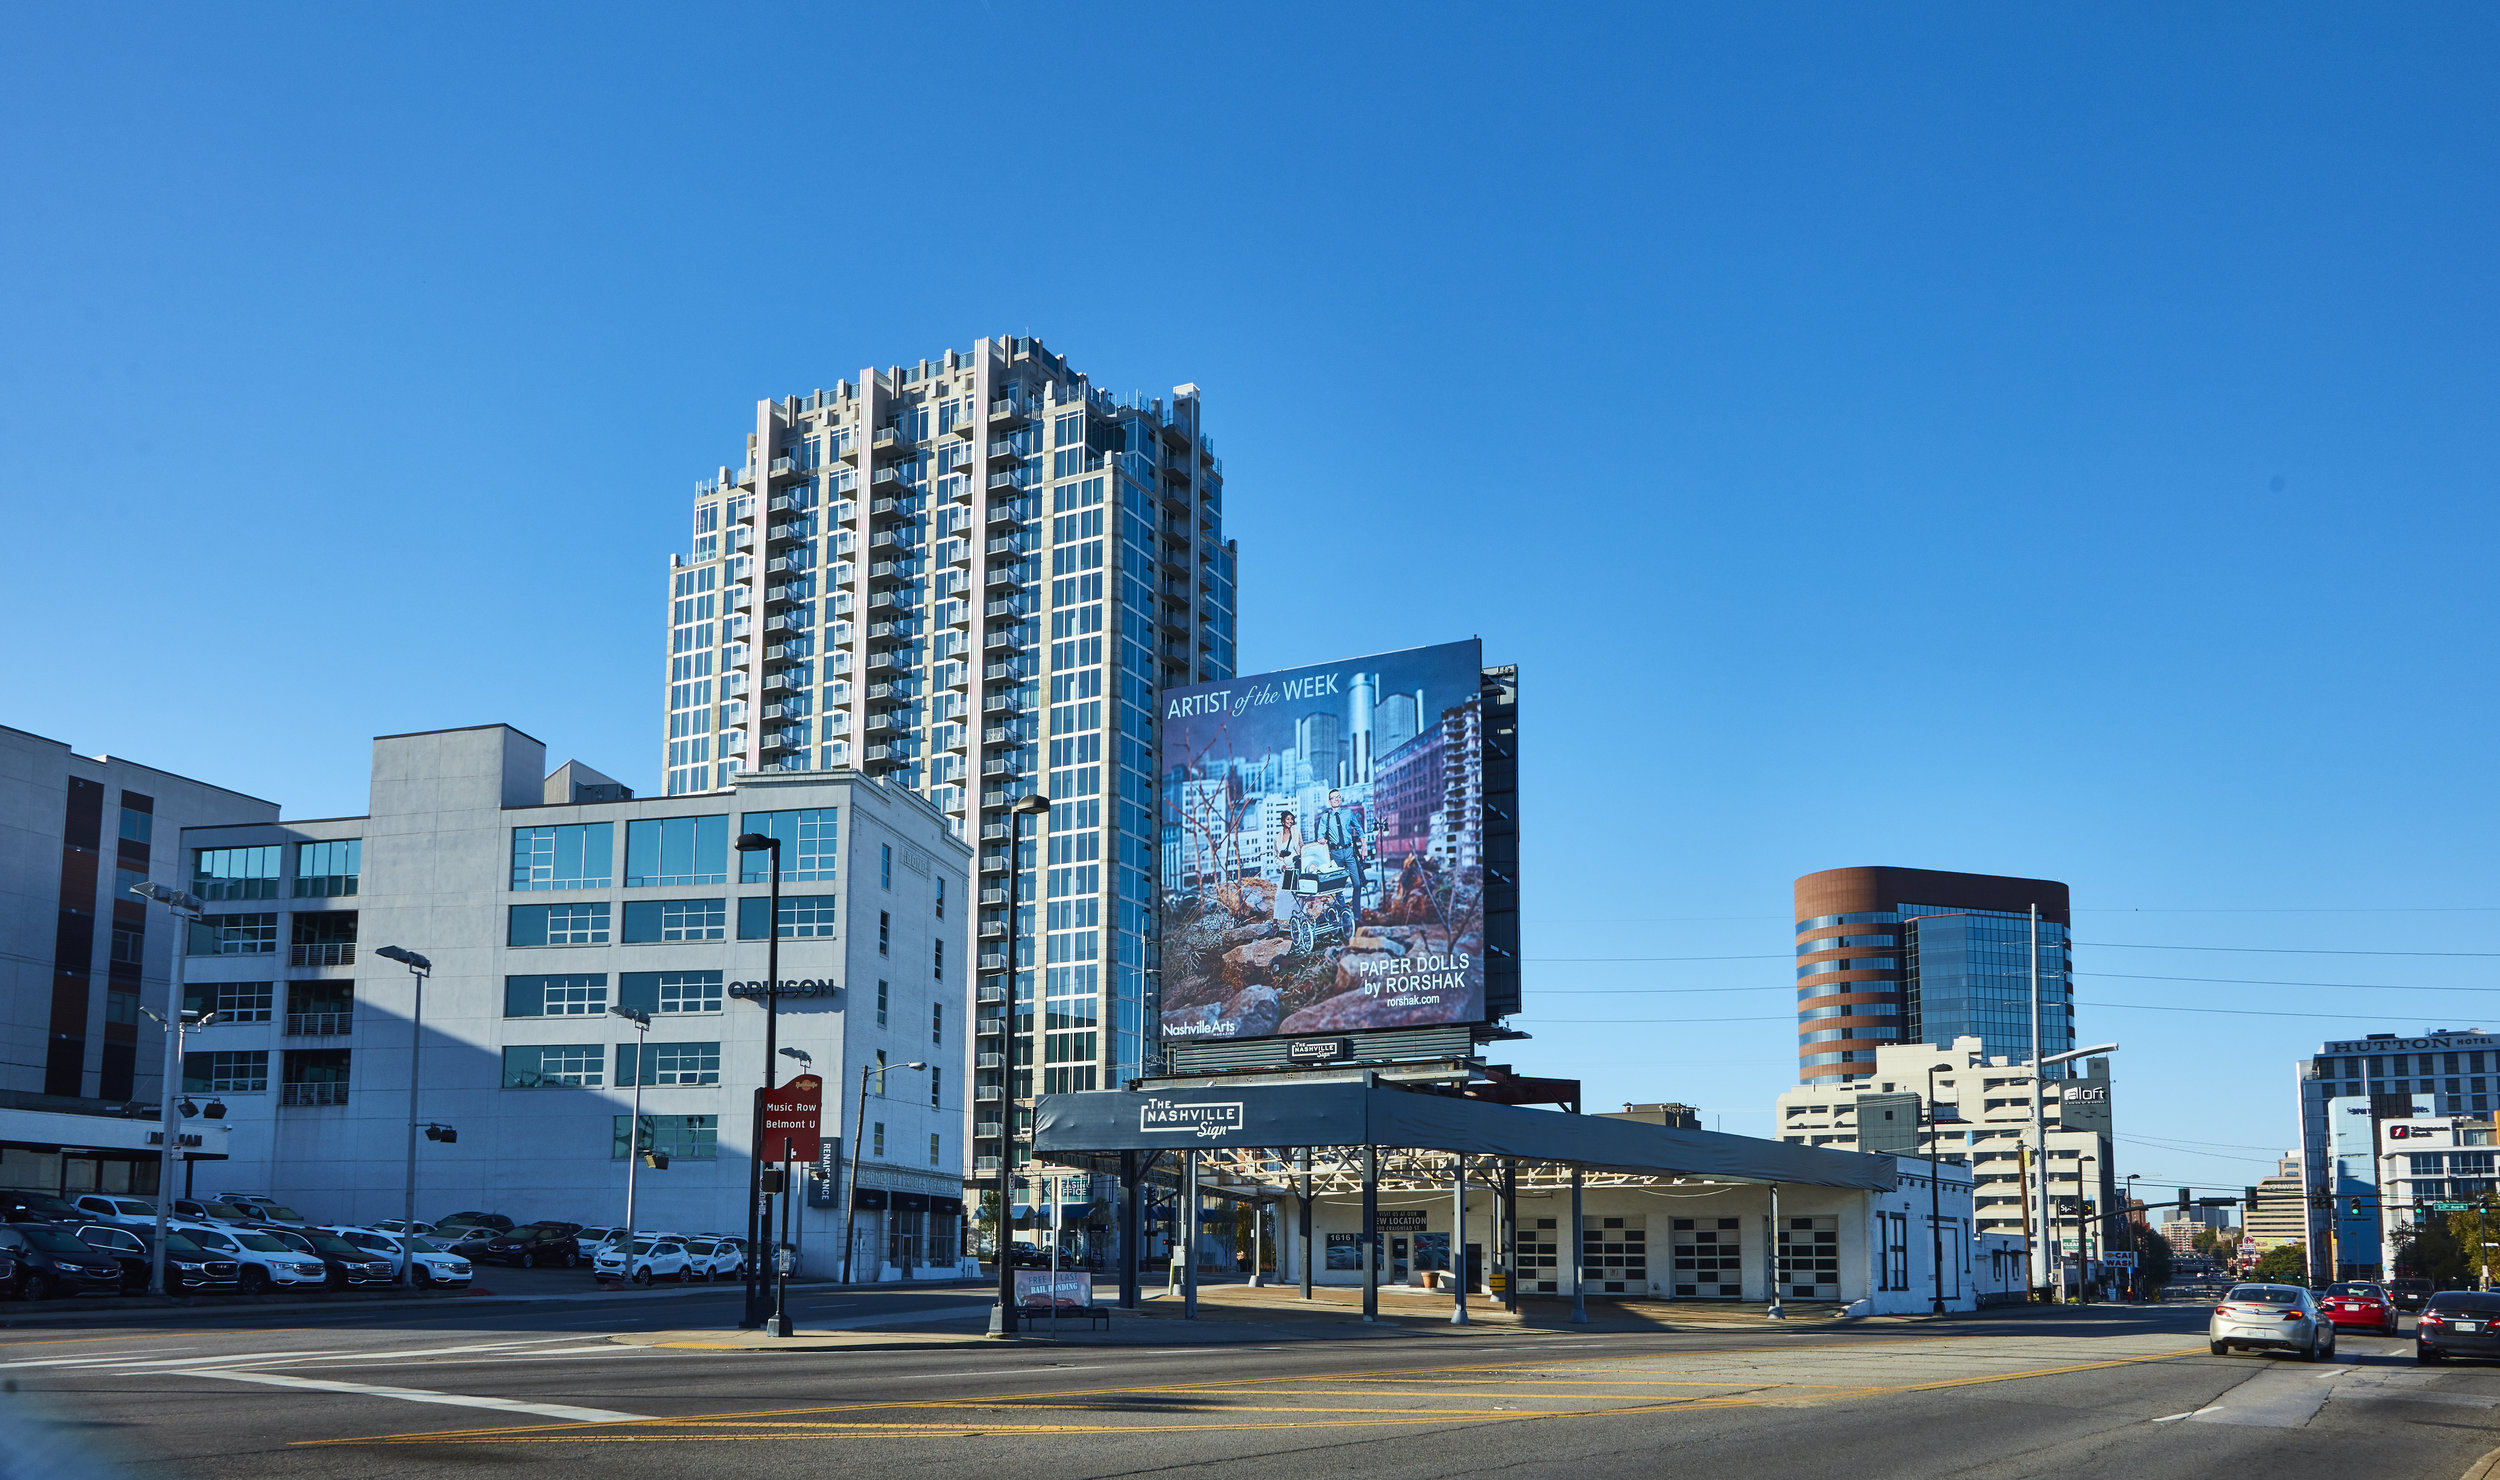 rorshak_billboard 15.jpg